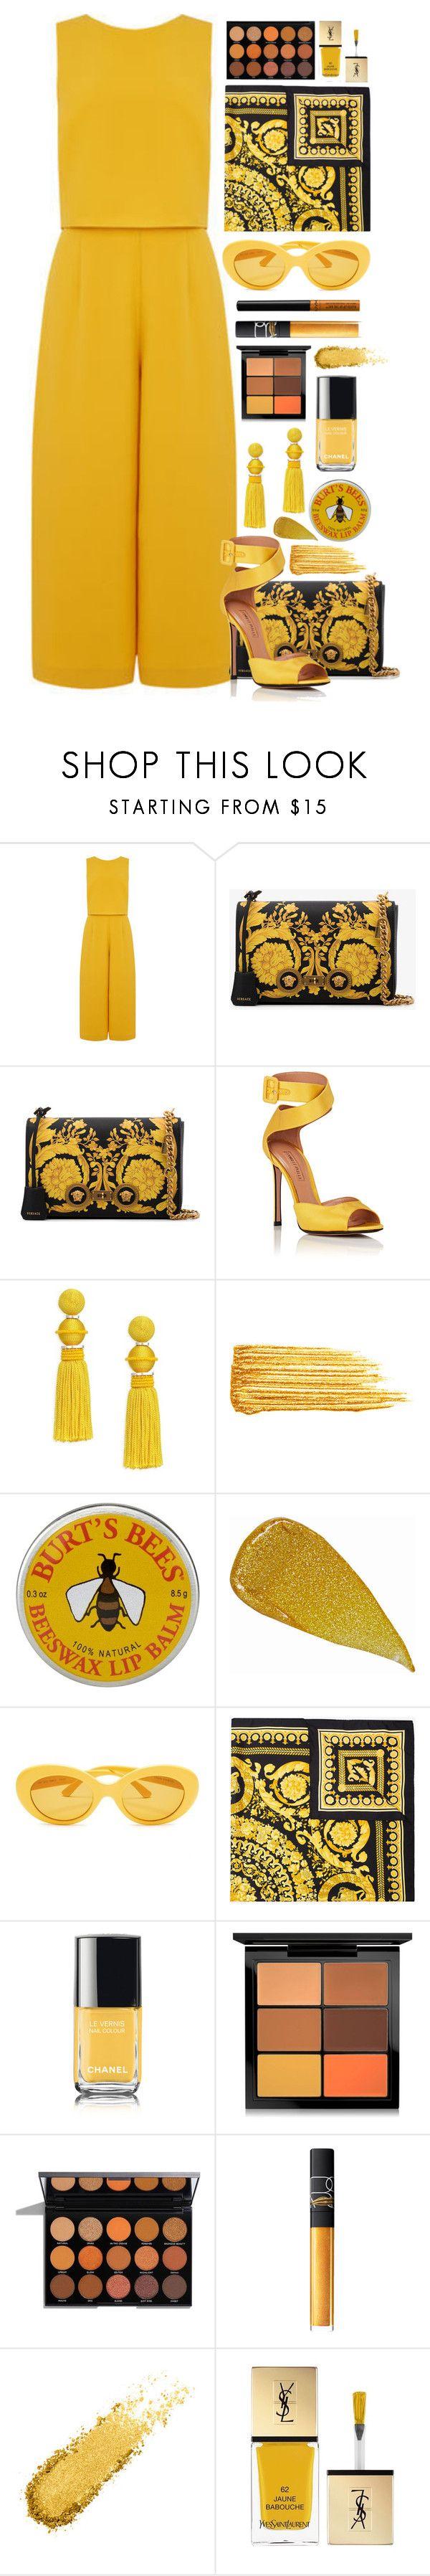 """Untitled #2751"" by seventeene ❤ liked on Polyvore featuring Warehouse, Versace, Samuele Failli, Oscar de la Renta, Yves Saint Laurent, John Lewis, NARS Cosmetics, Chanel, MAC Cosmetics and NYX"